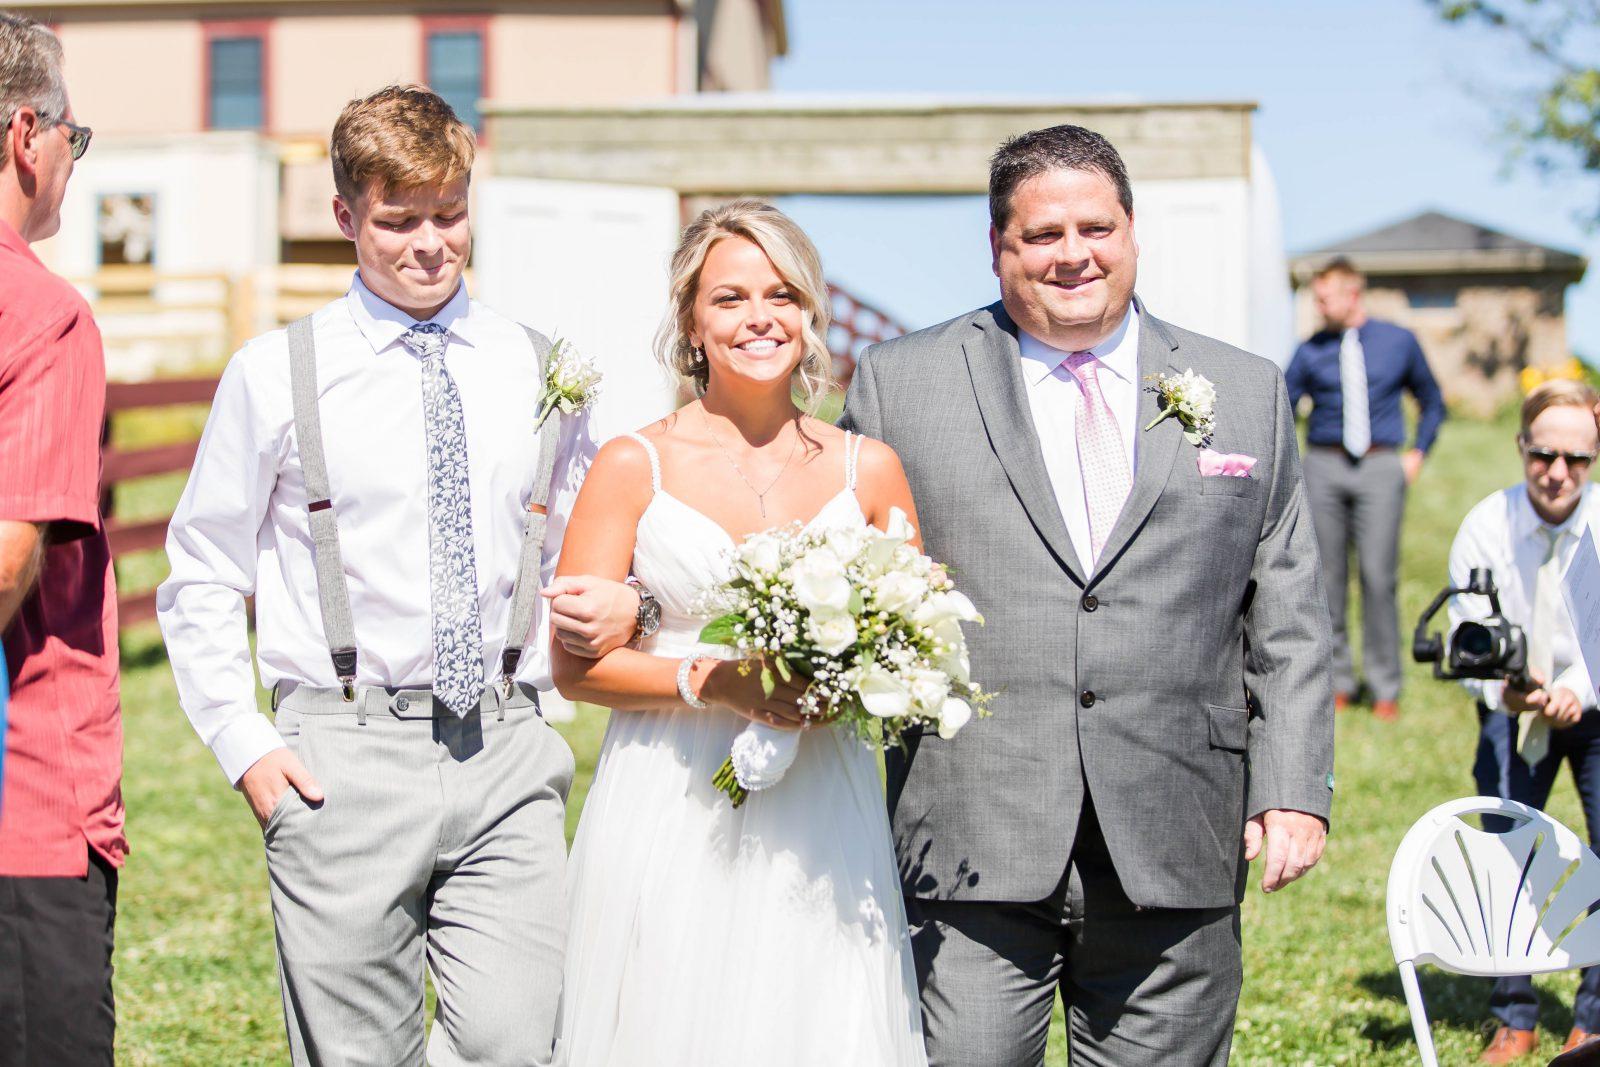 peacock-ridge-summer-wedding-photographer-akron-ohio-loren-jackson-photography-70